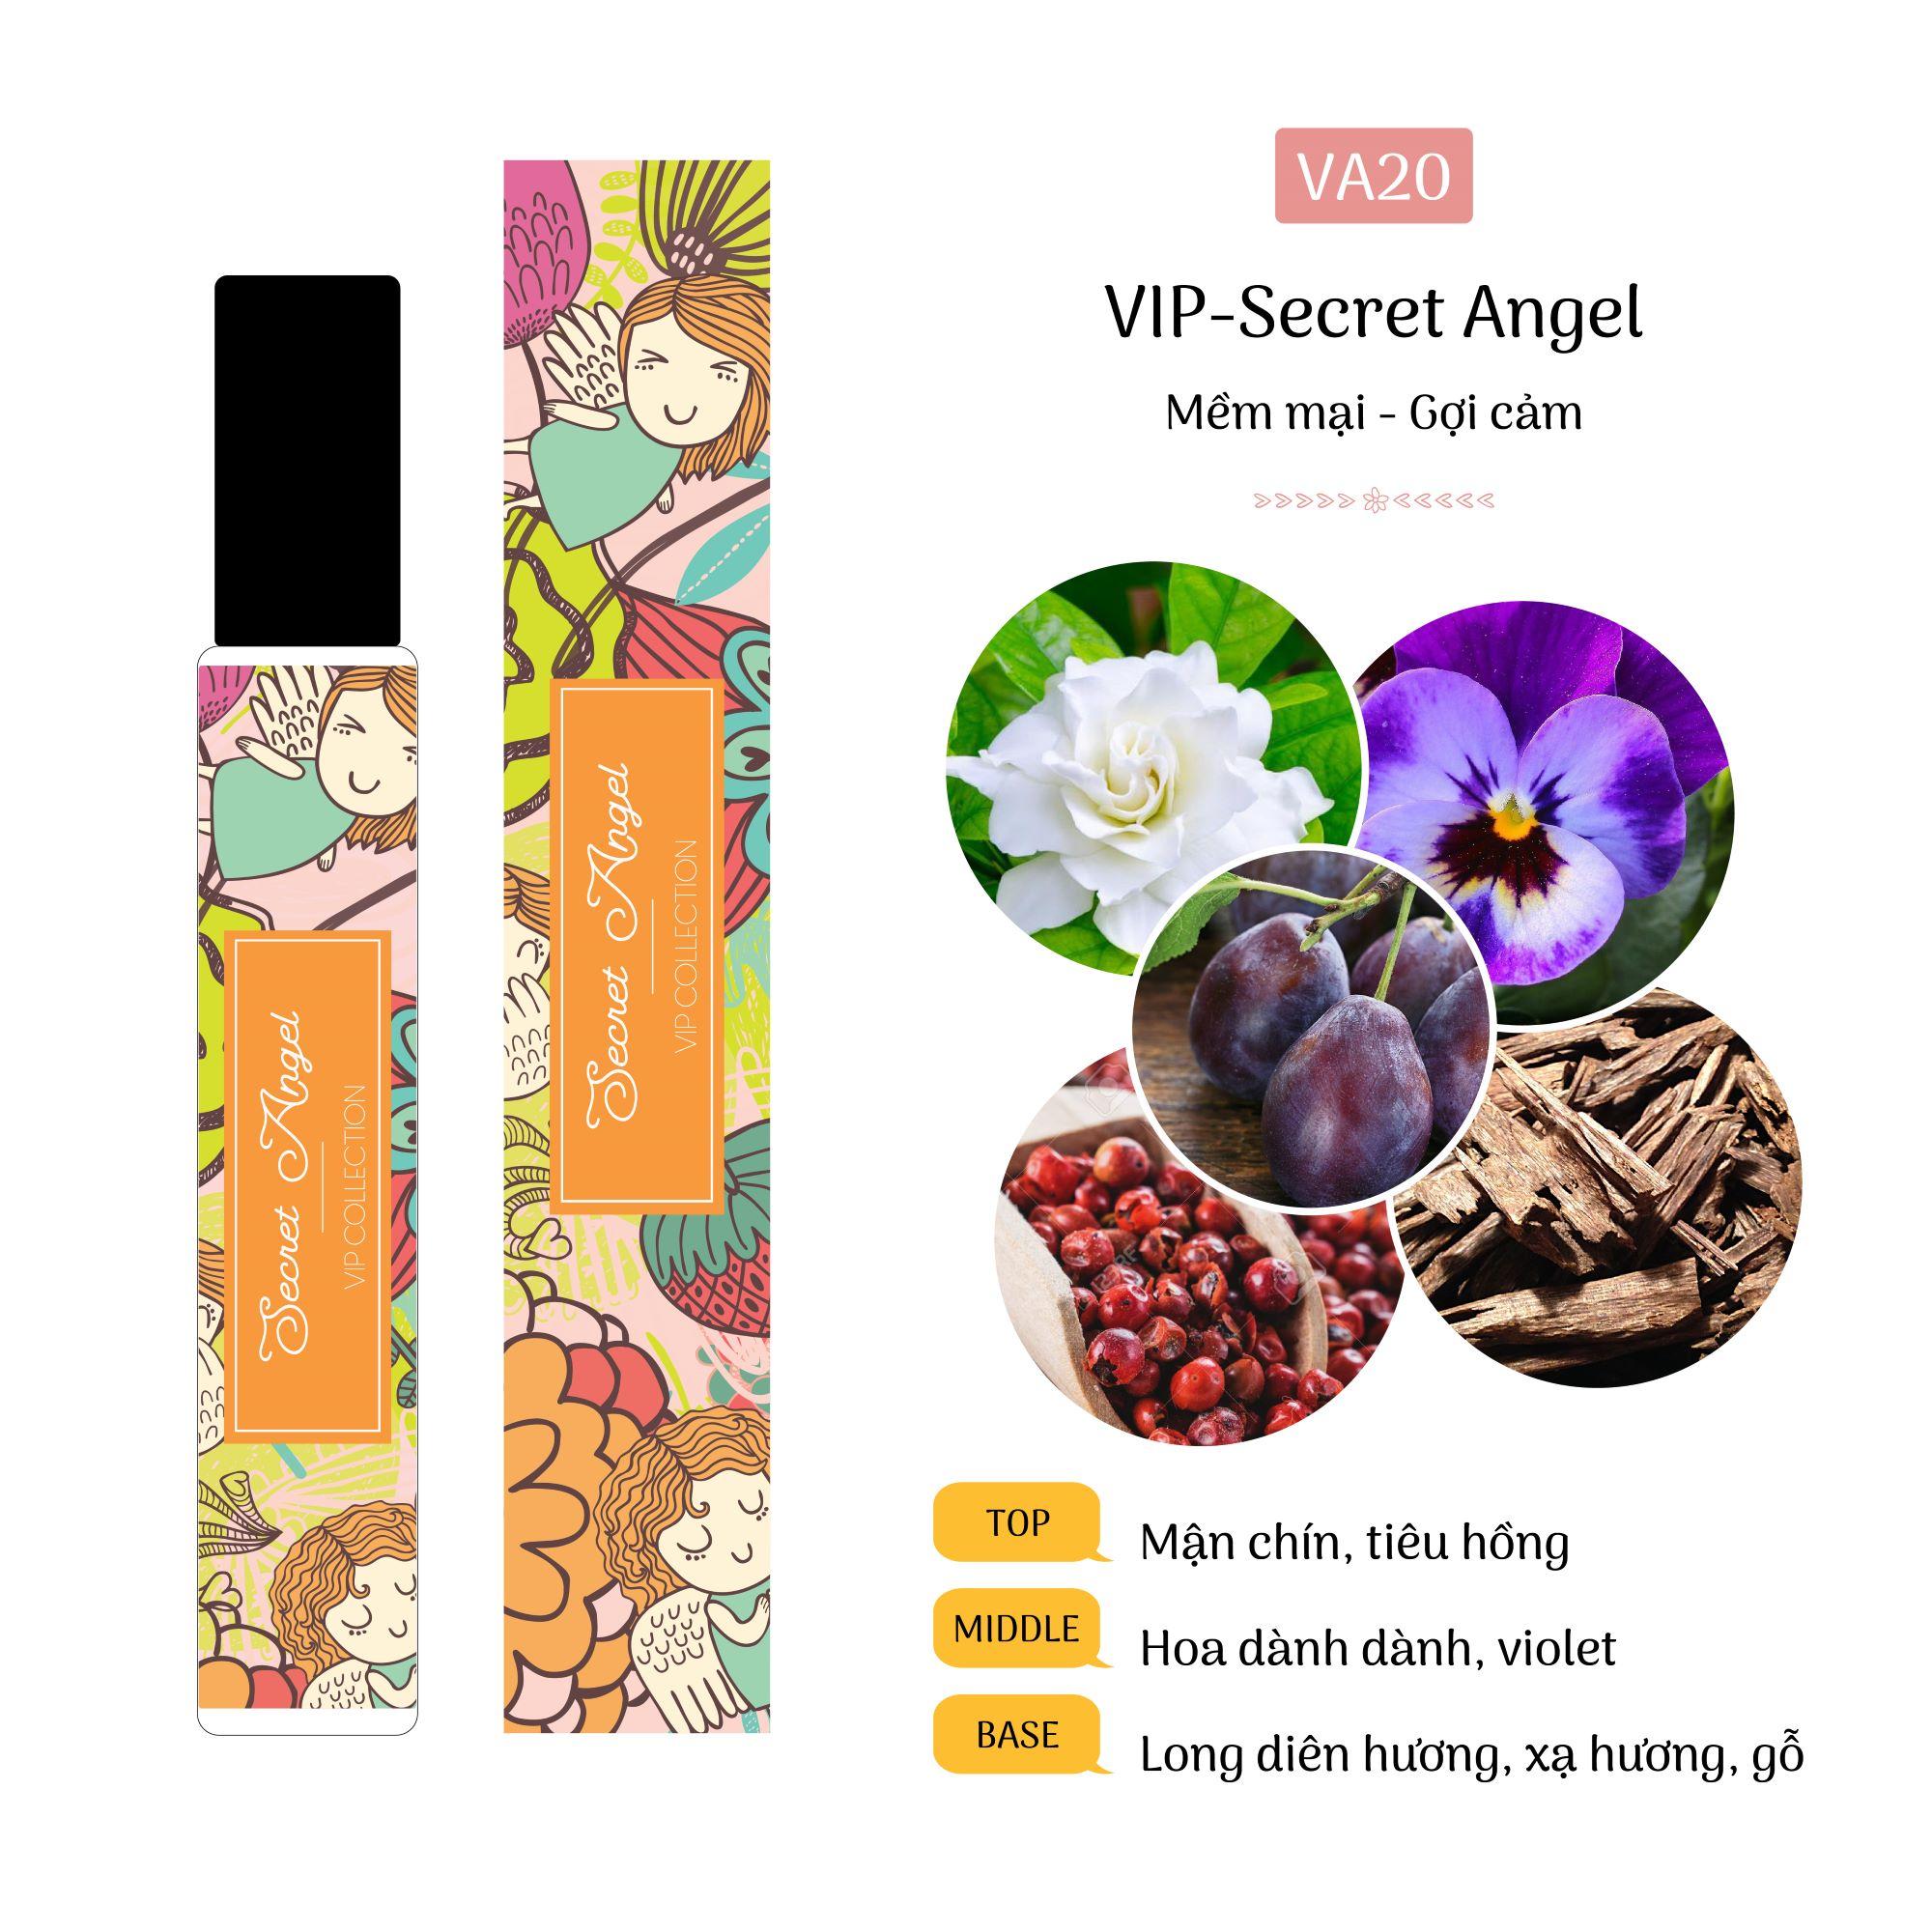 Tinh Dầu Nước Hoa Pháp Secret Angel